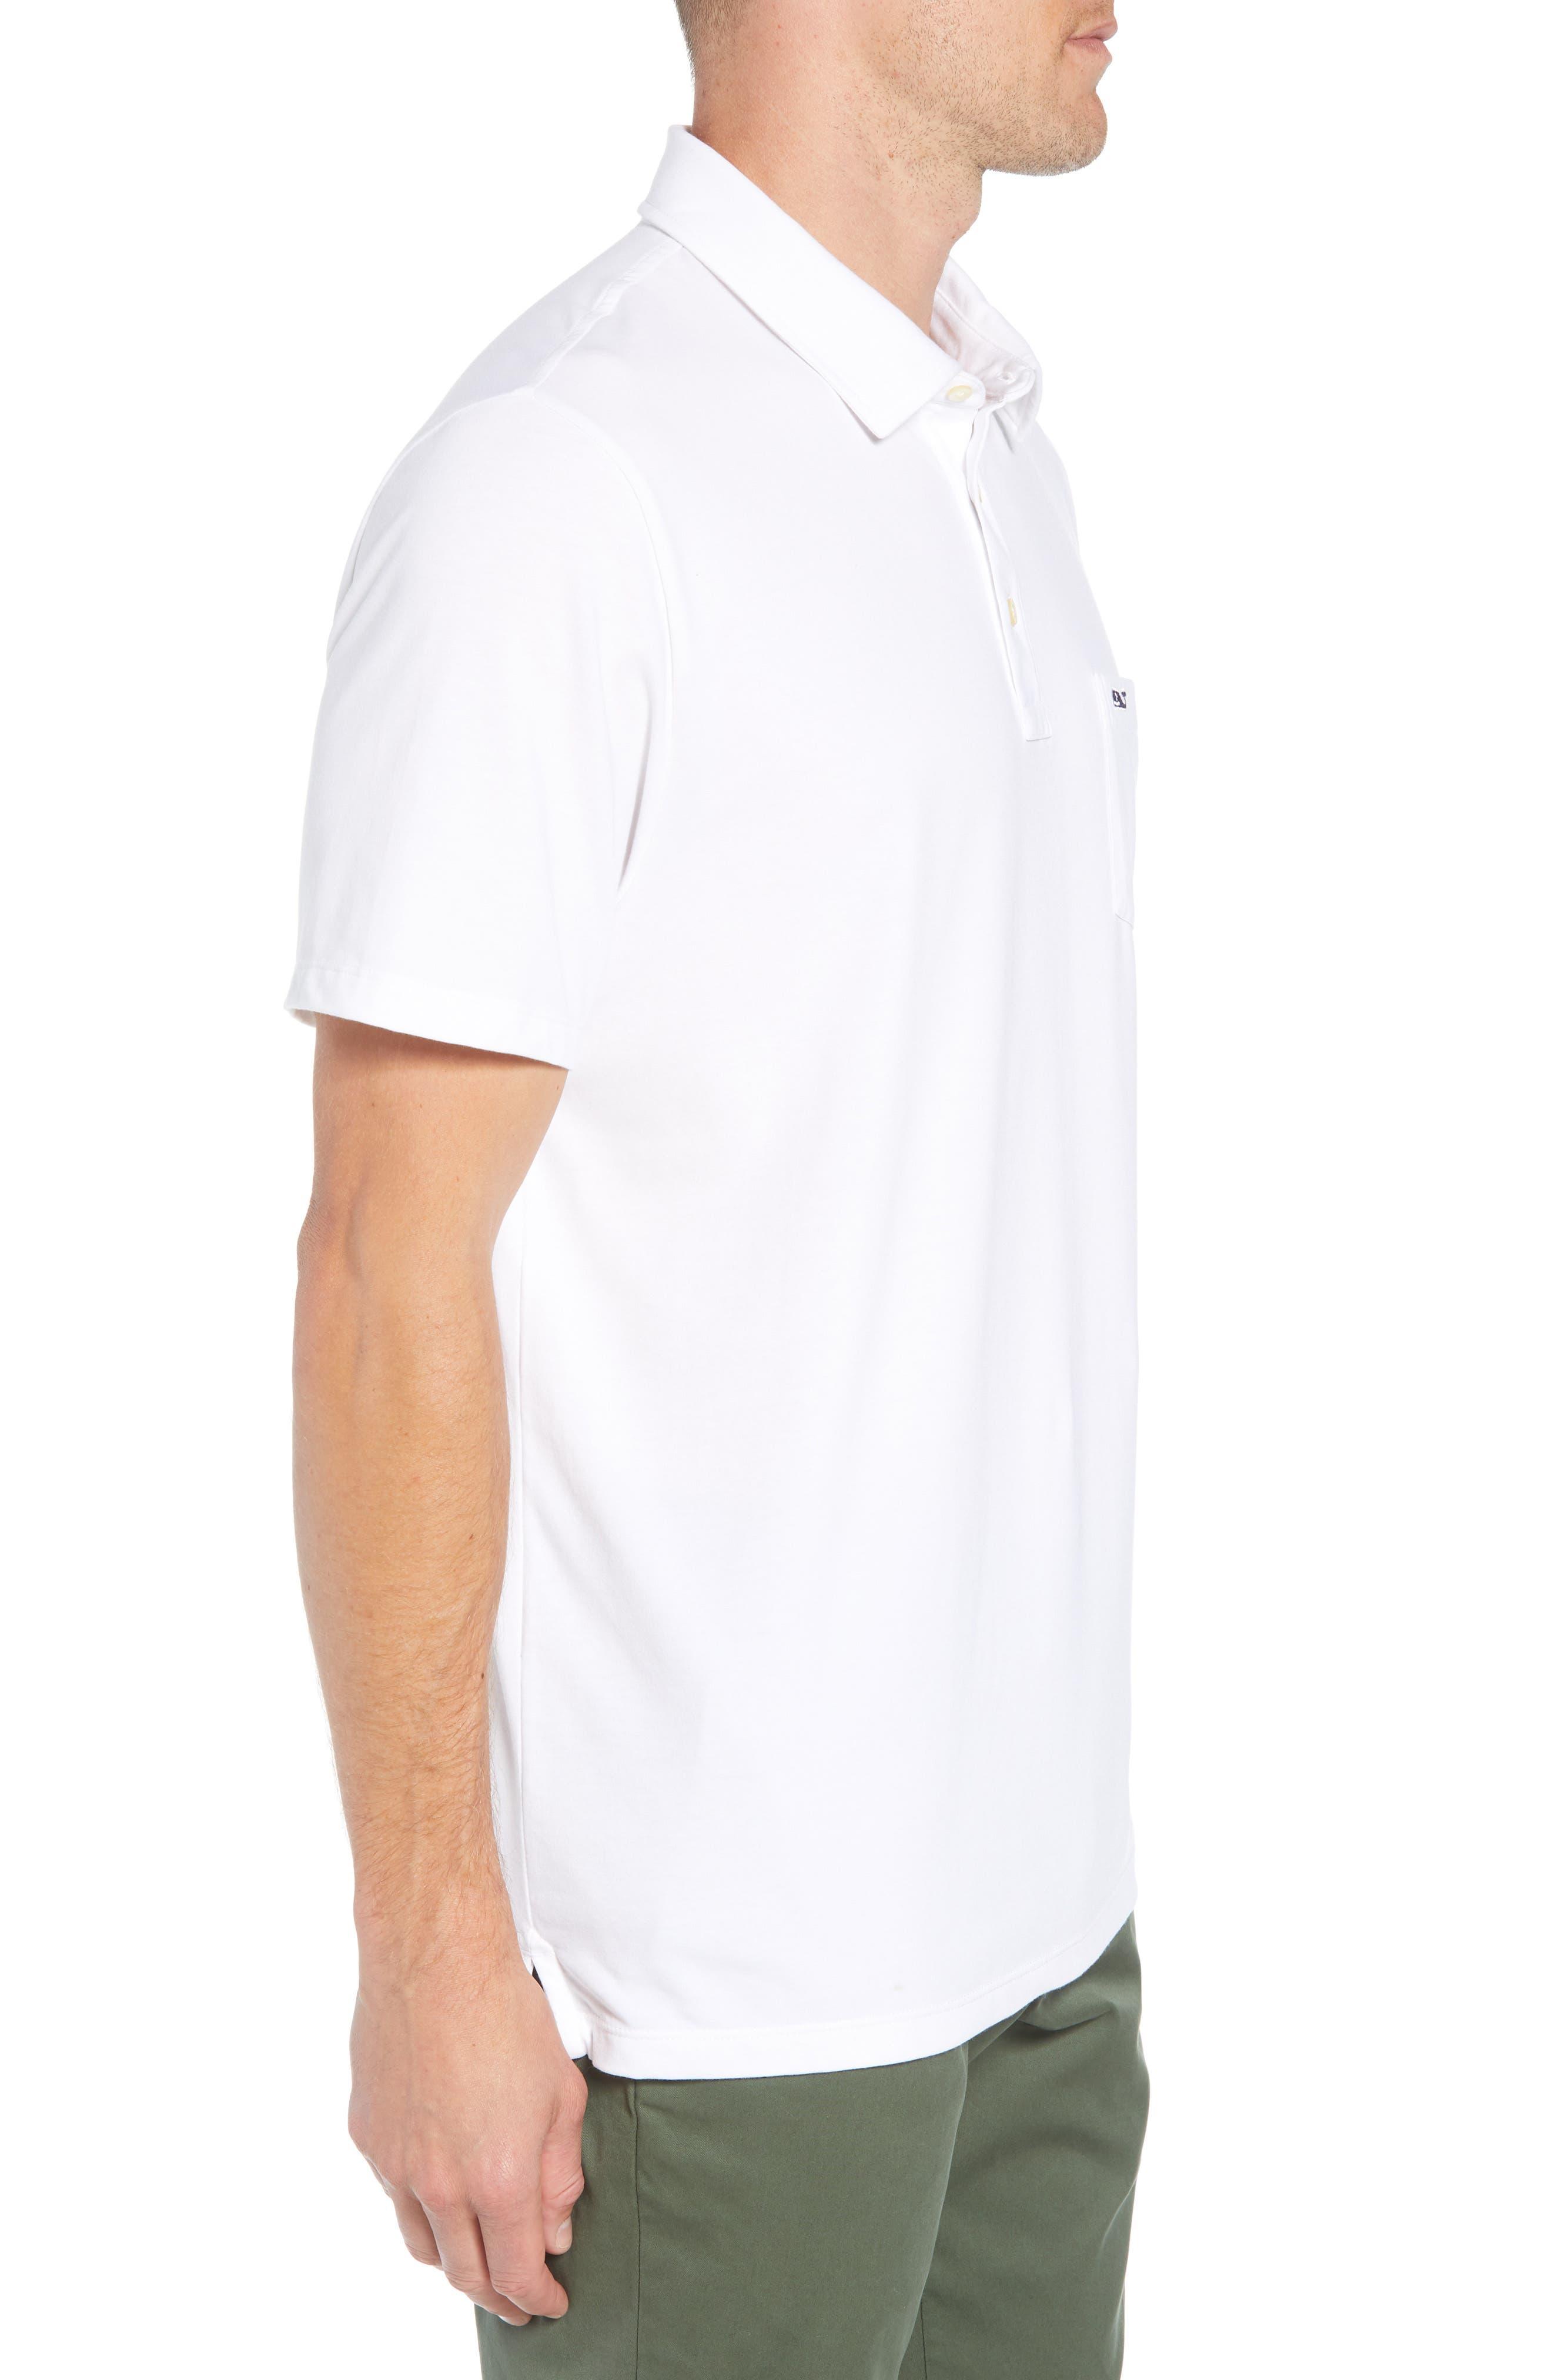 VINEYARD VINES, Edgartown Polo Shirt, Alternate thumbnail 3, color, WHITE CAP